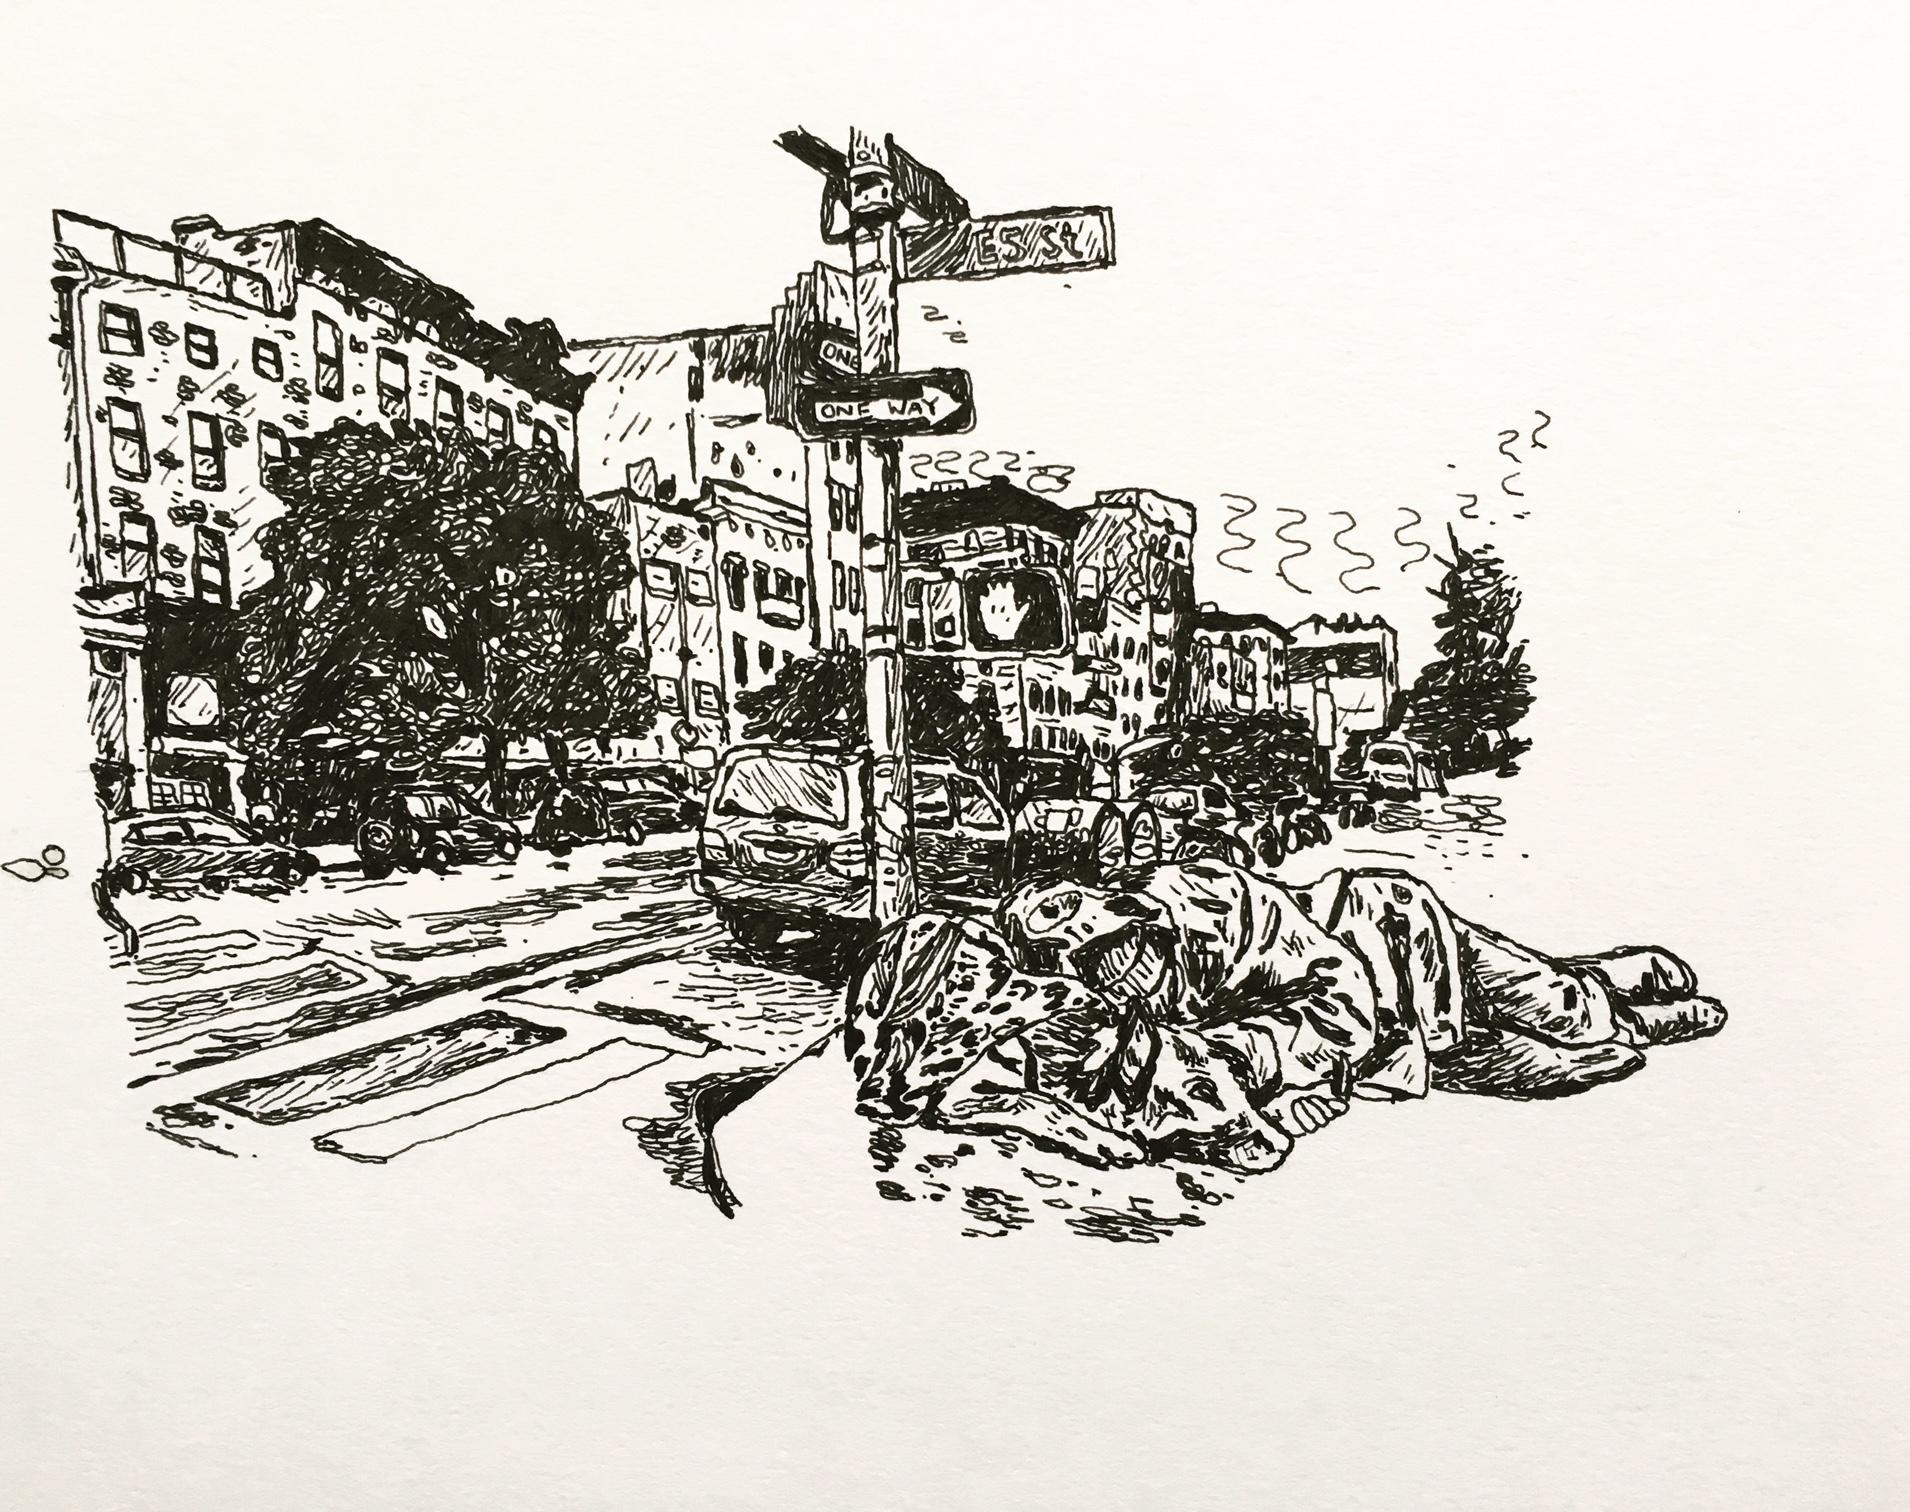 Tribeca, Homeless and Dog